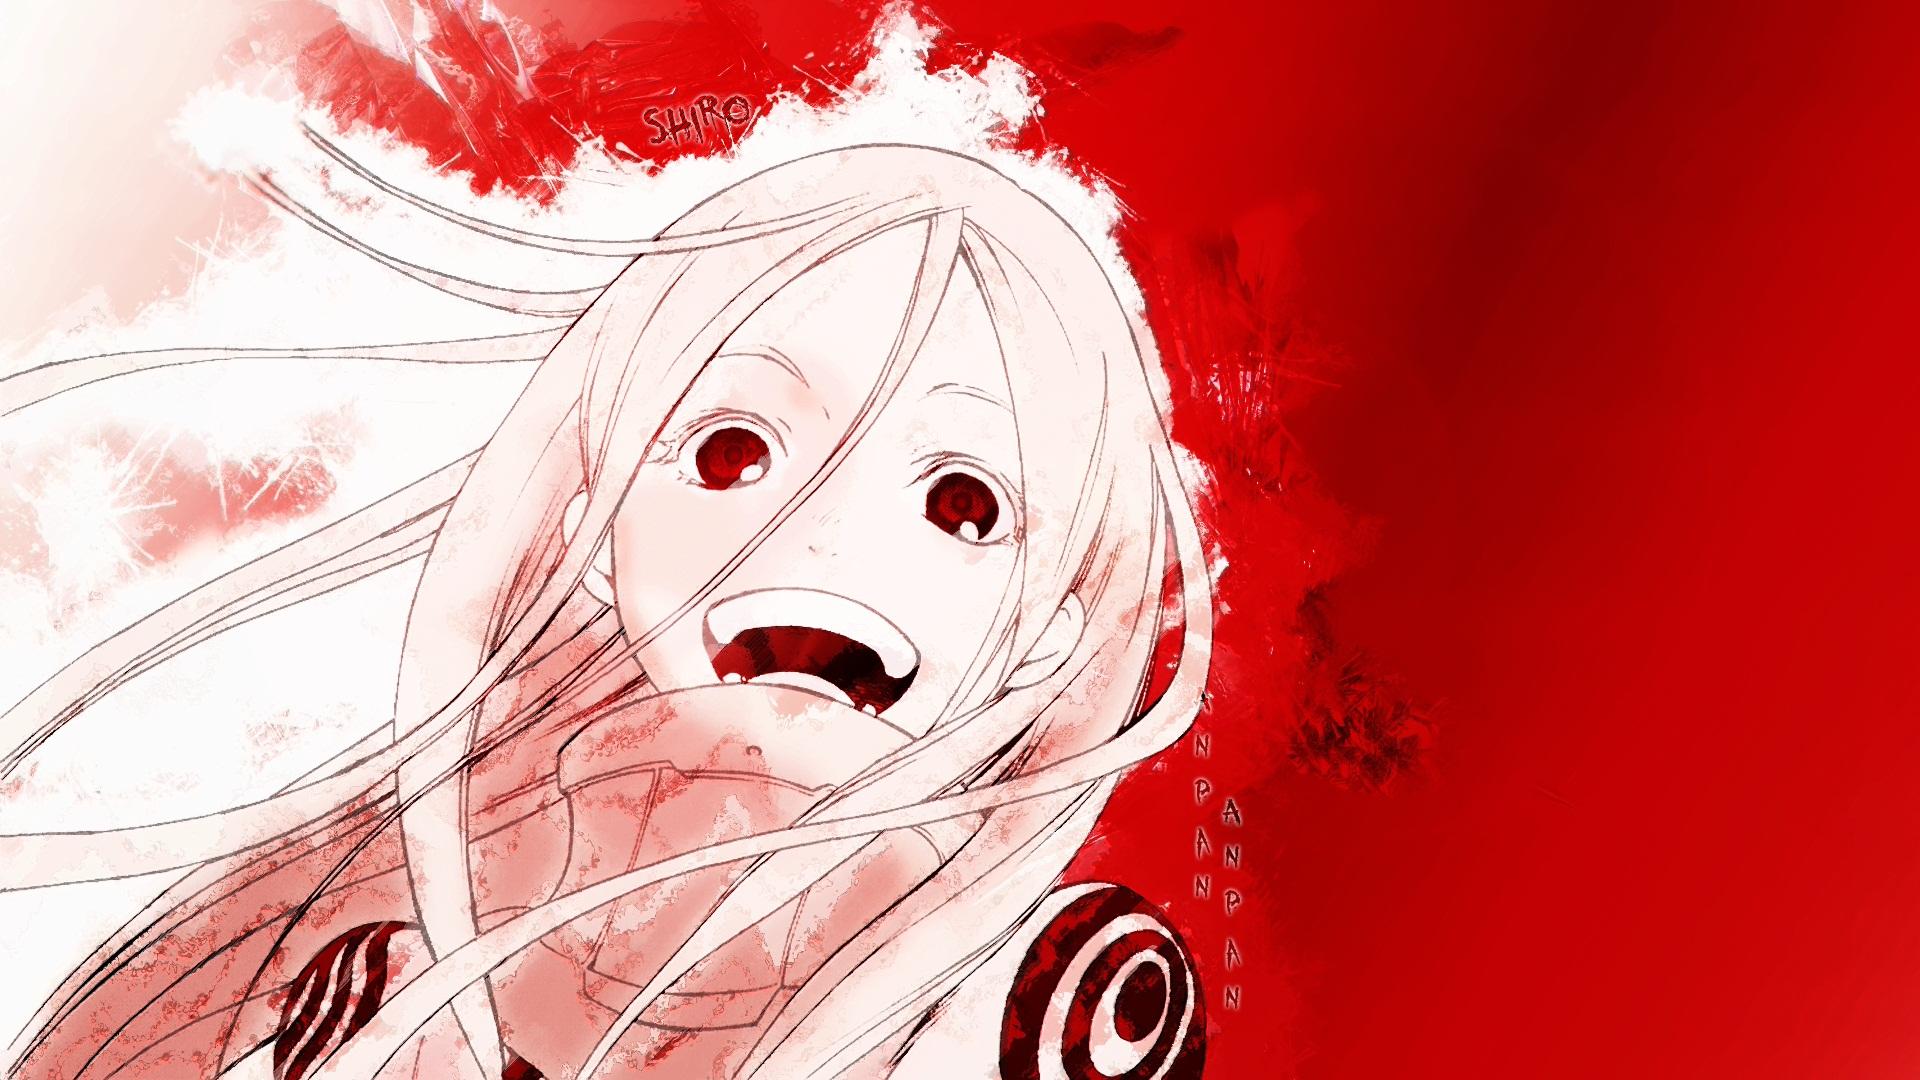 Anime Wallpaper Free Download Deadman Wonderland Shiro Deadman Wonderland Wallpaper